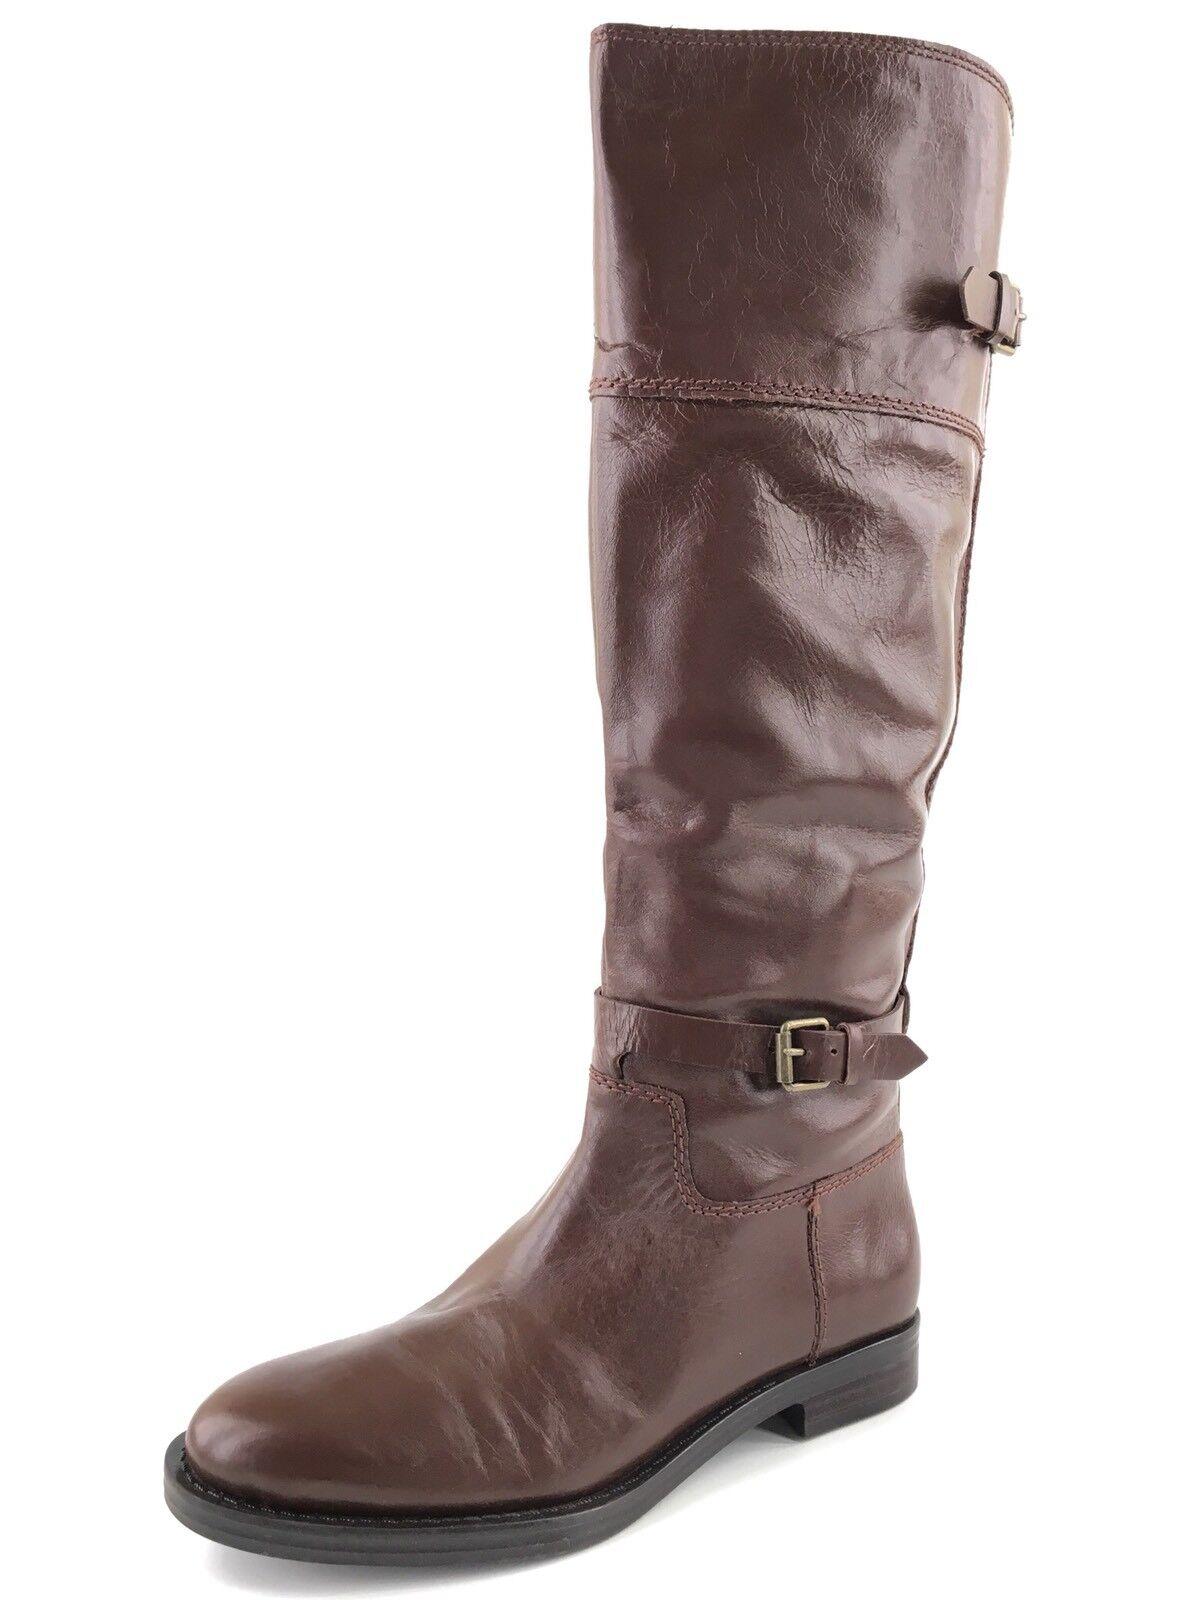 NEU Enzo Angiolini Eero Braun Leder Knee High Stiefel Damens's Größe 5.5 M ^